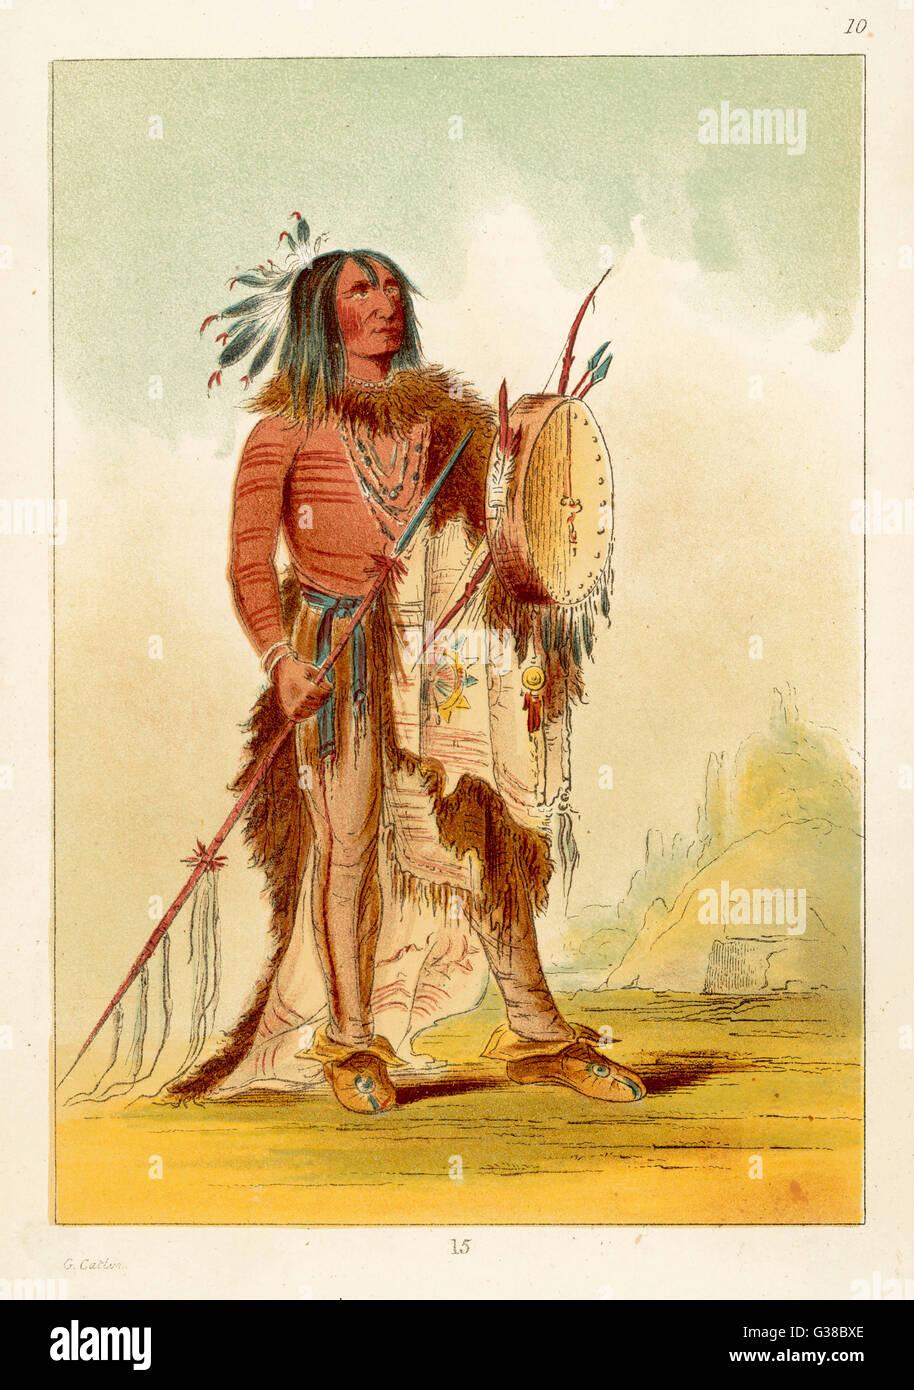 Wun-nes-tou, medicine man of Blackfeet tribe Date: 1830